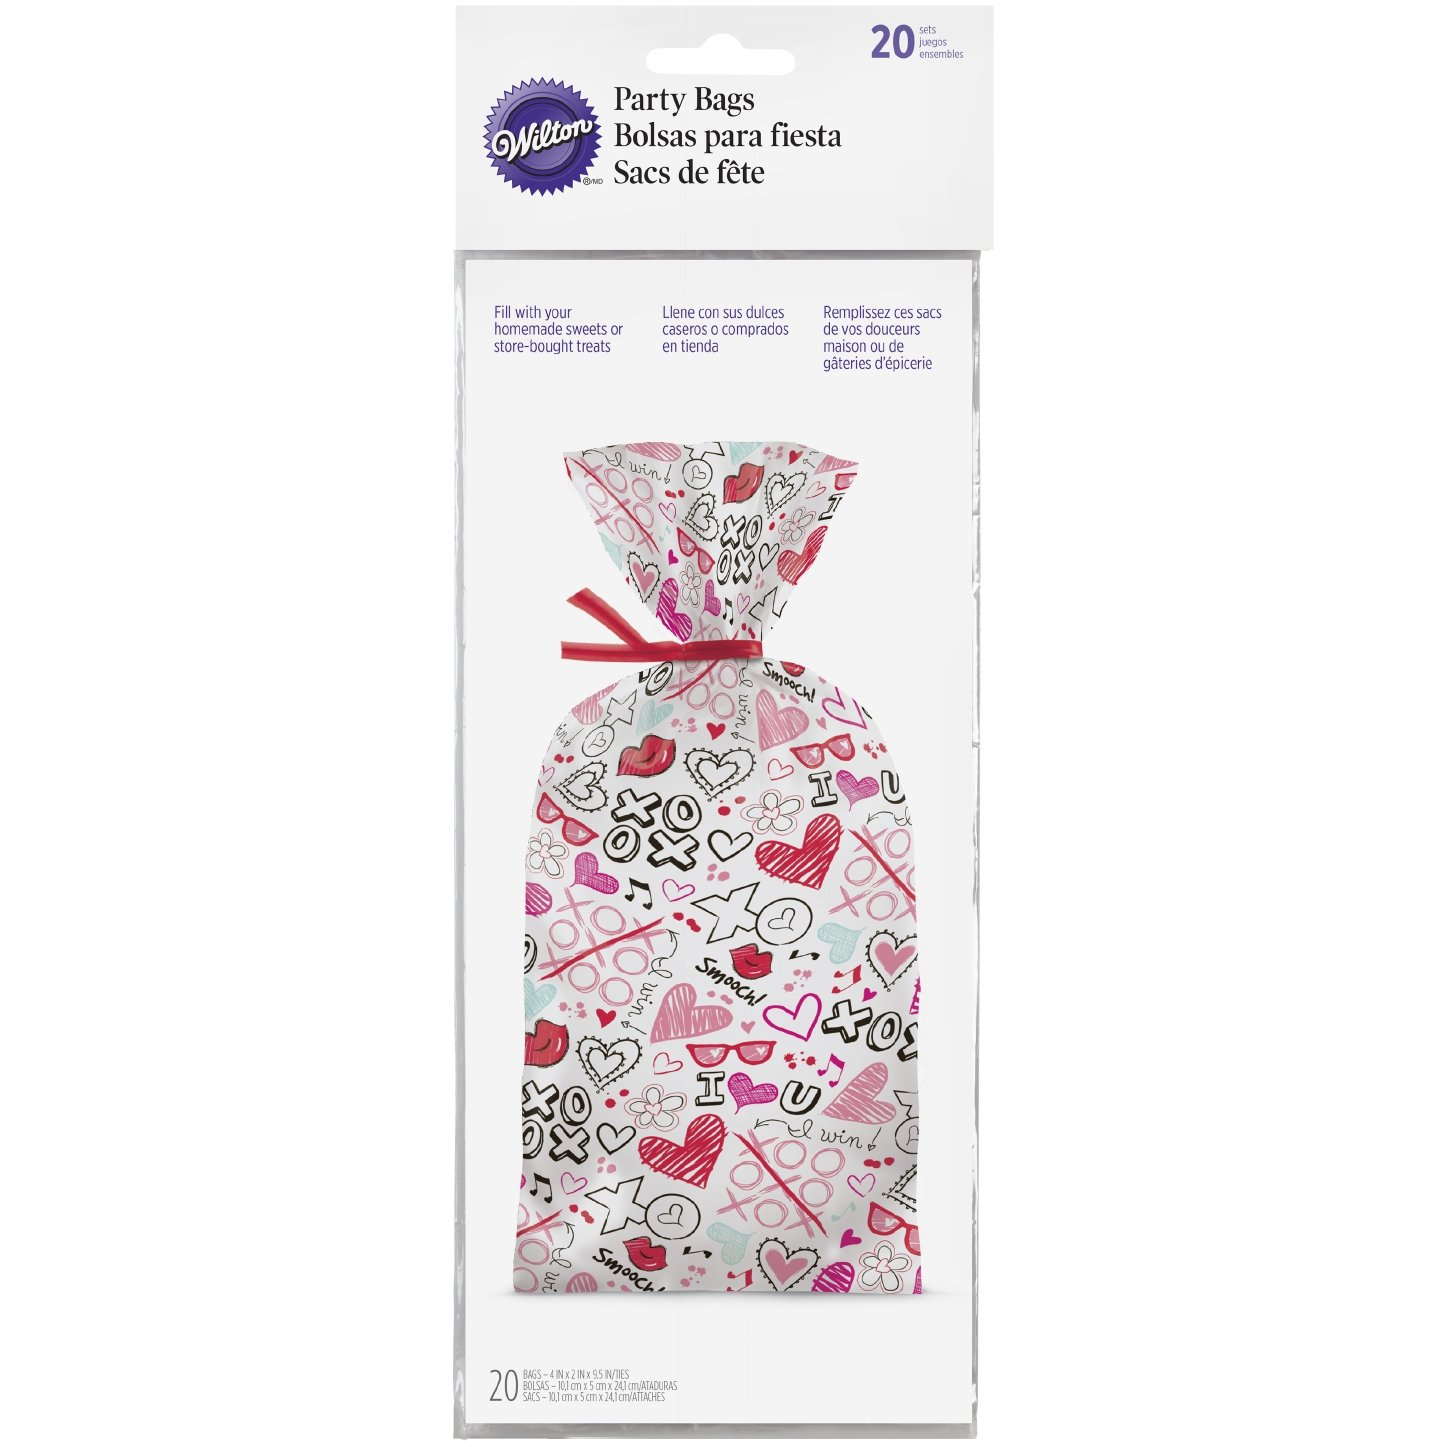 Wilton spread Love Sprinkle Kindness confetti Witon 1912-5325